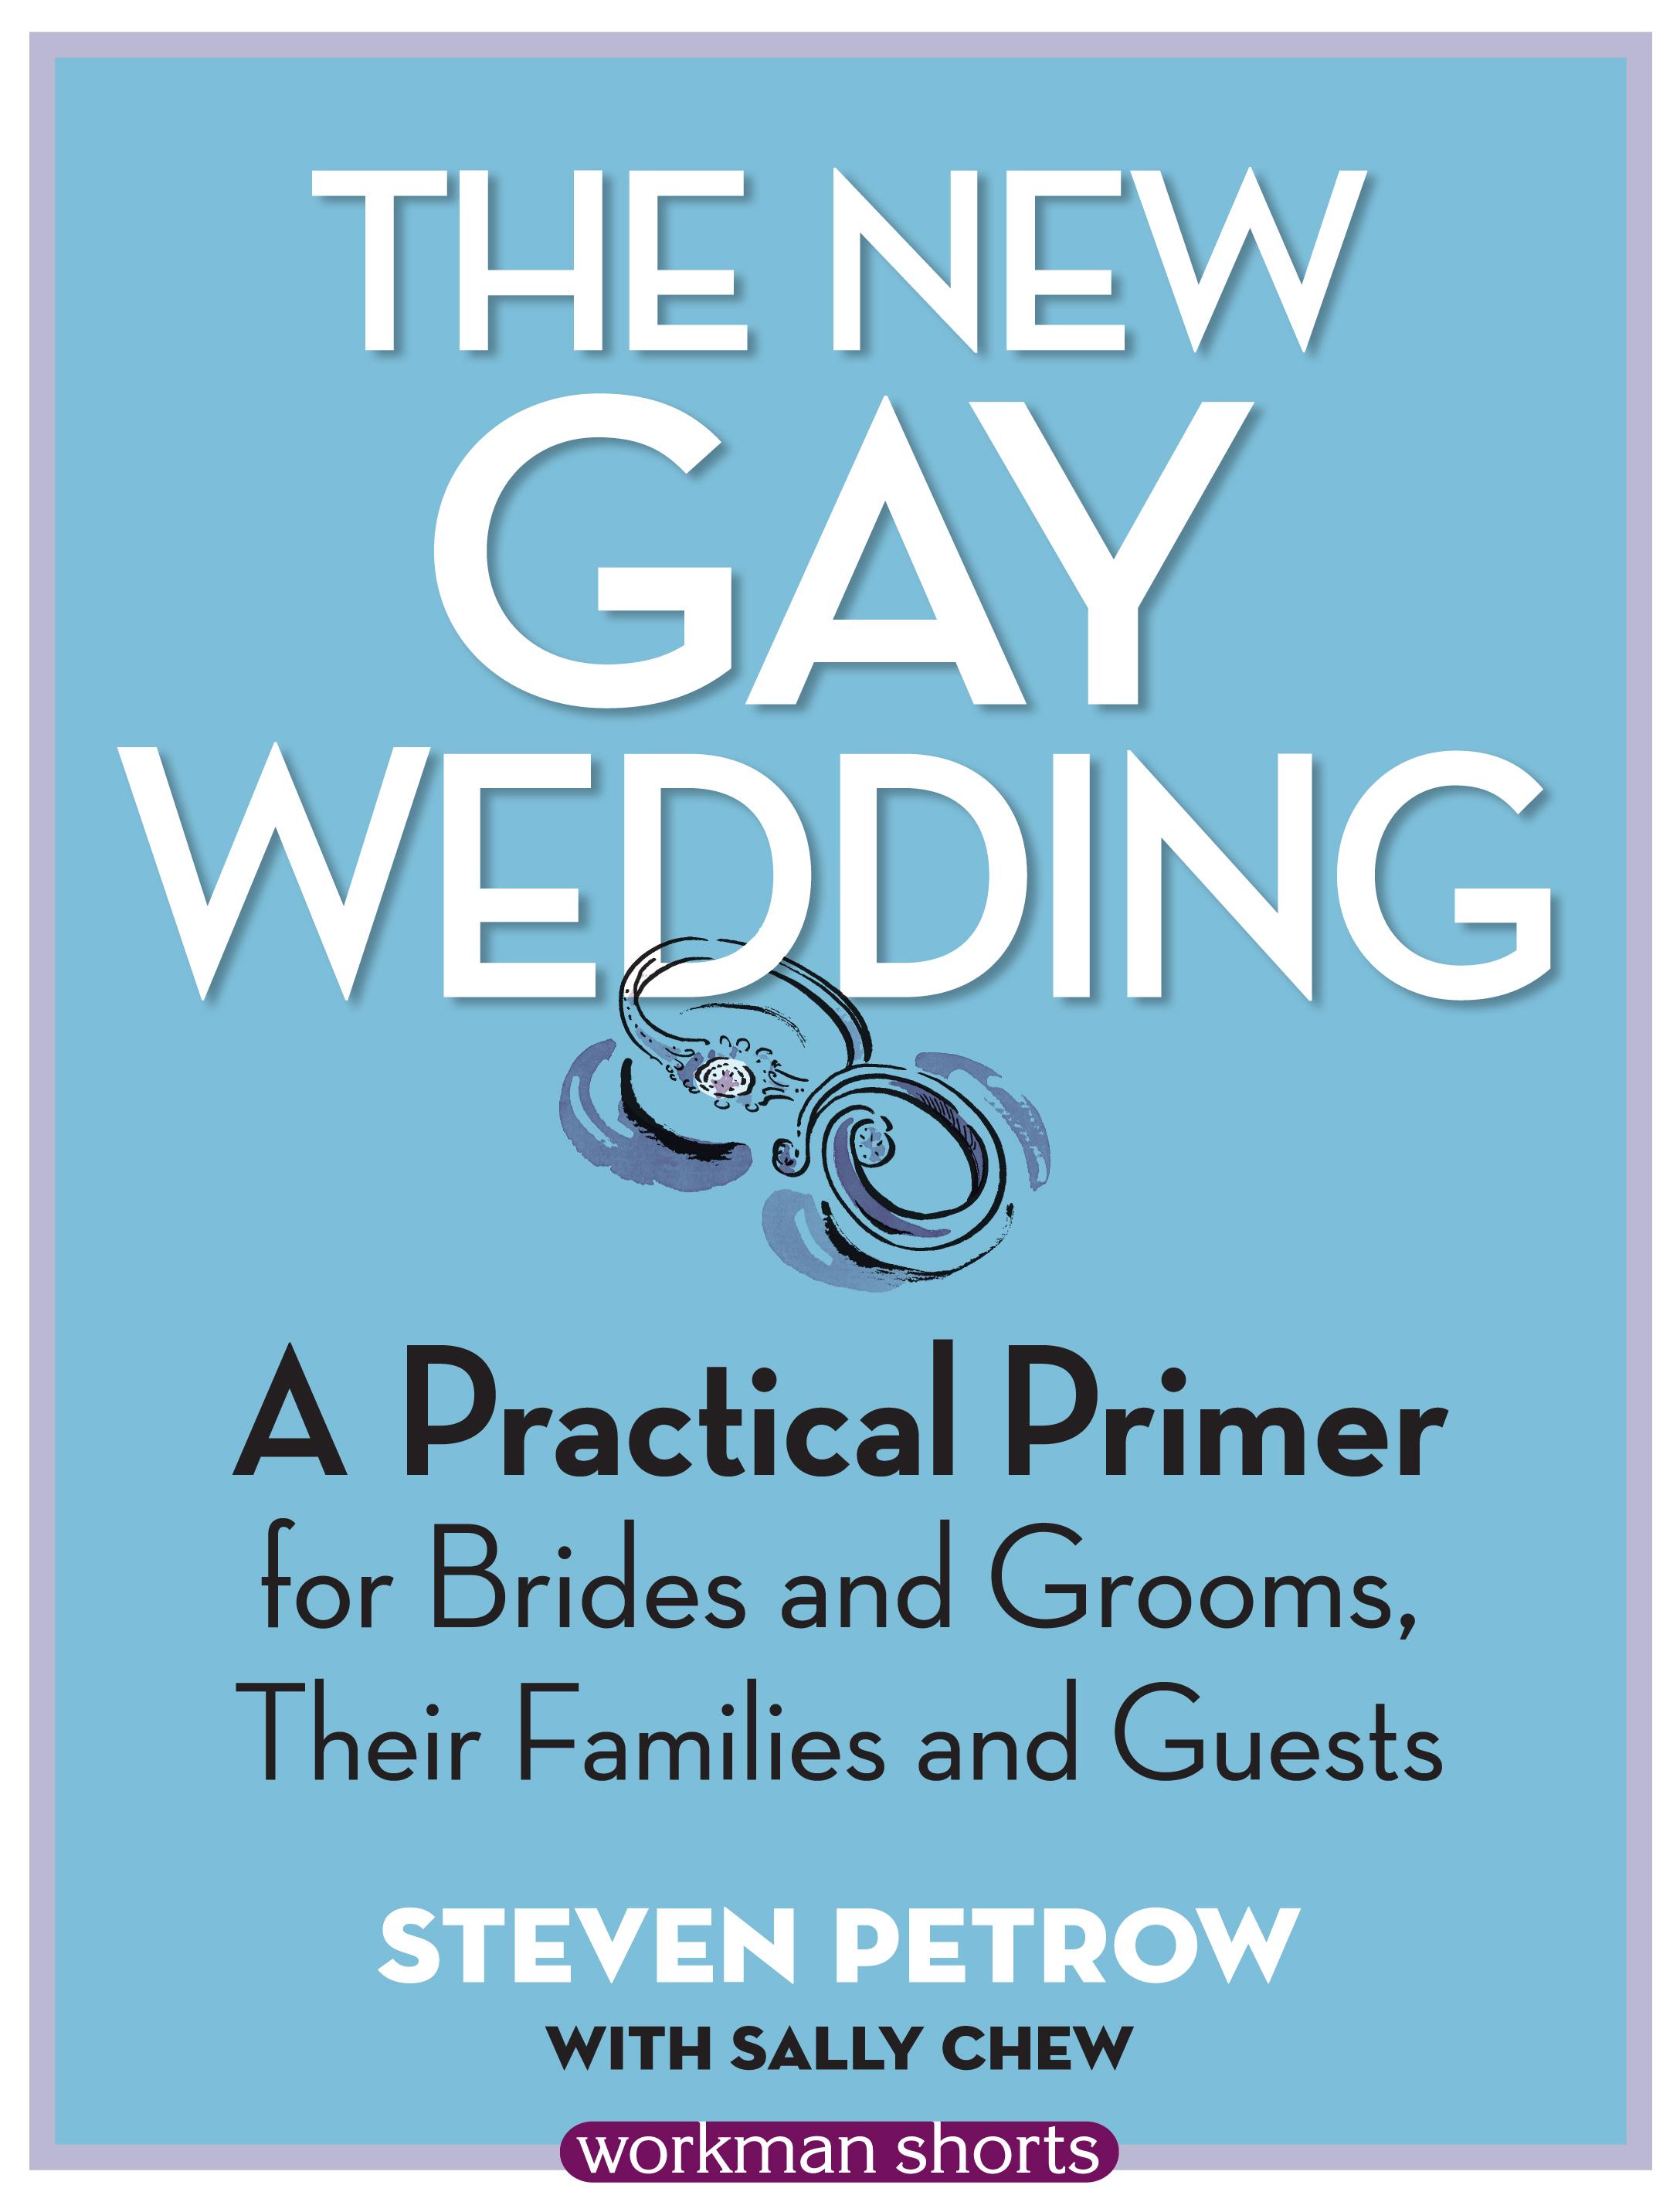 2011-12-13-GayWeddingseBookcvr.jpg